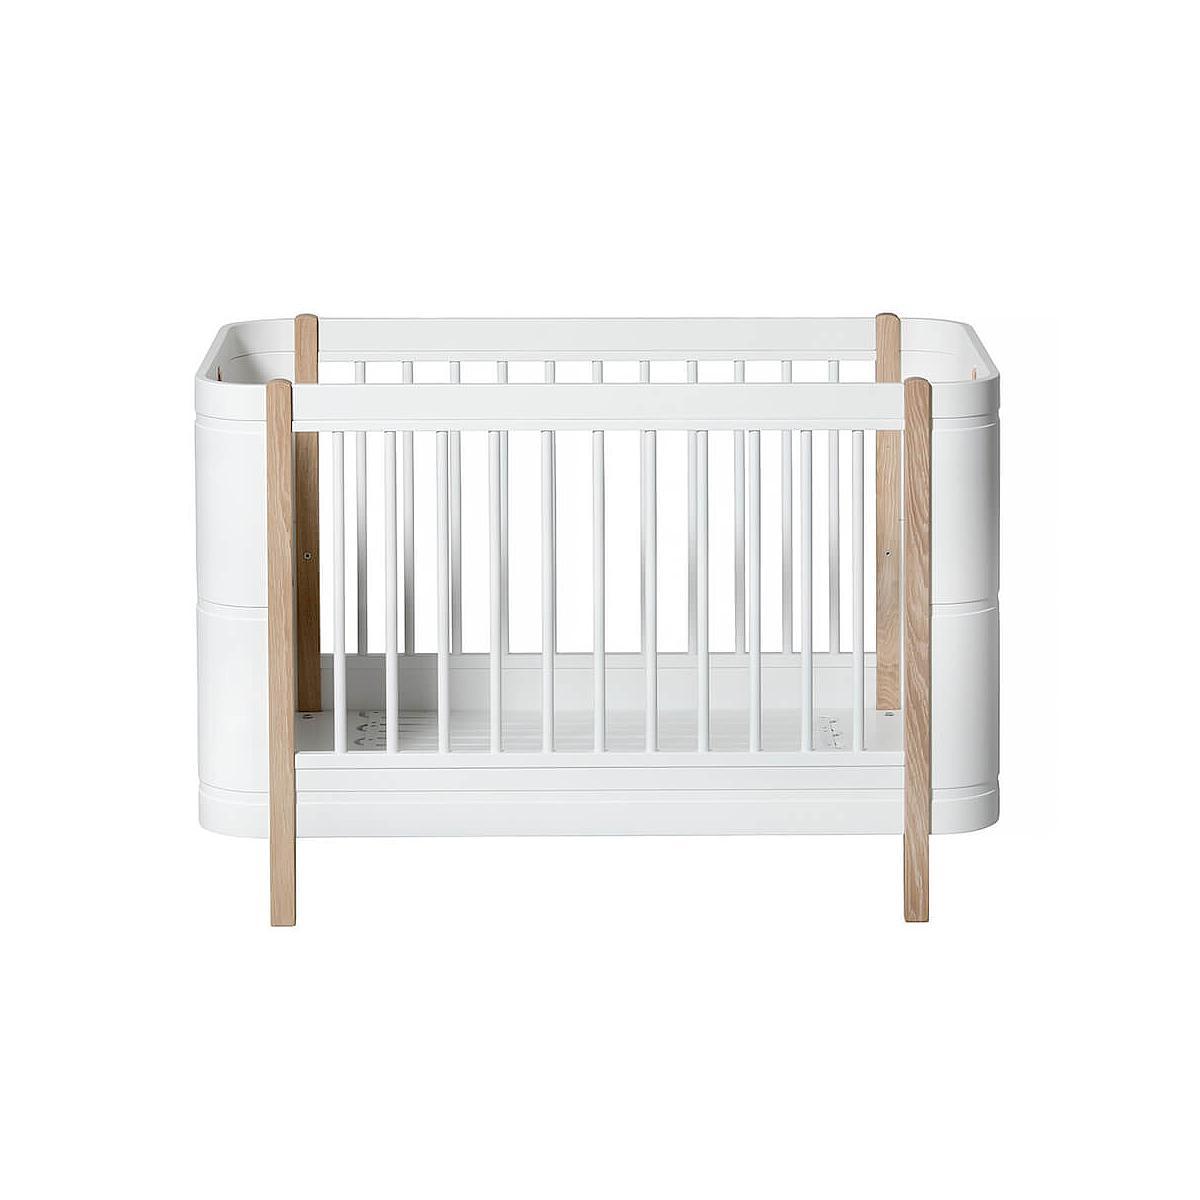 Lit bébé évolutif 68x122cm/162cm MINI+ WOOD Oliver Furniture blanc-chêne